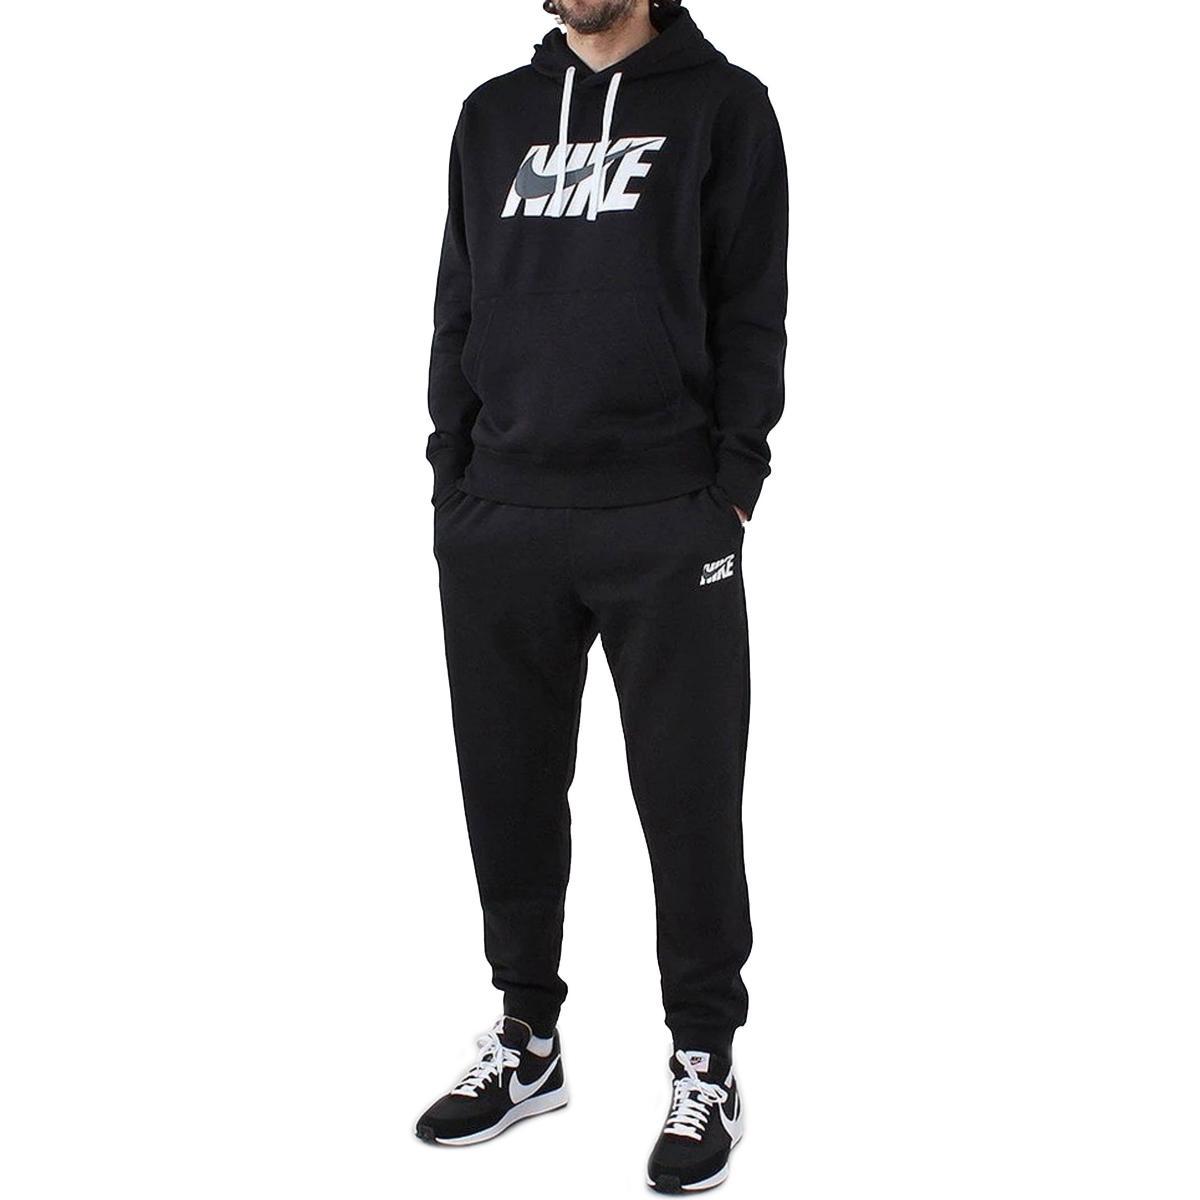 Tuta Nike Sportswear con felpa e pantatuta in fleece da uomo rif. CI9591